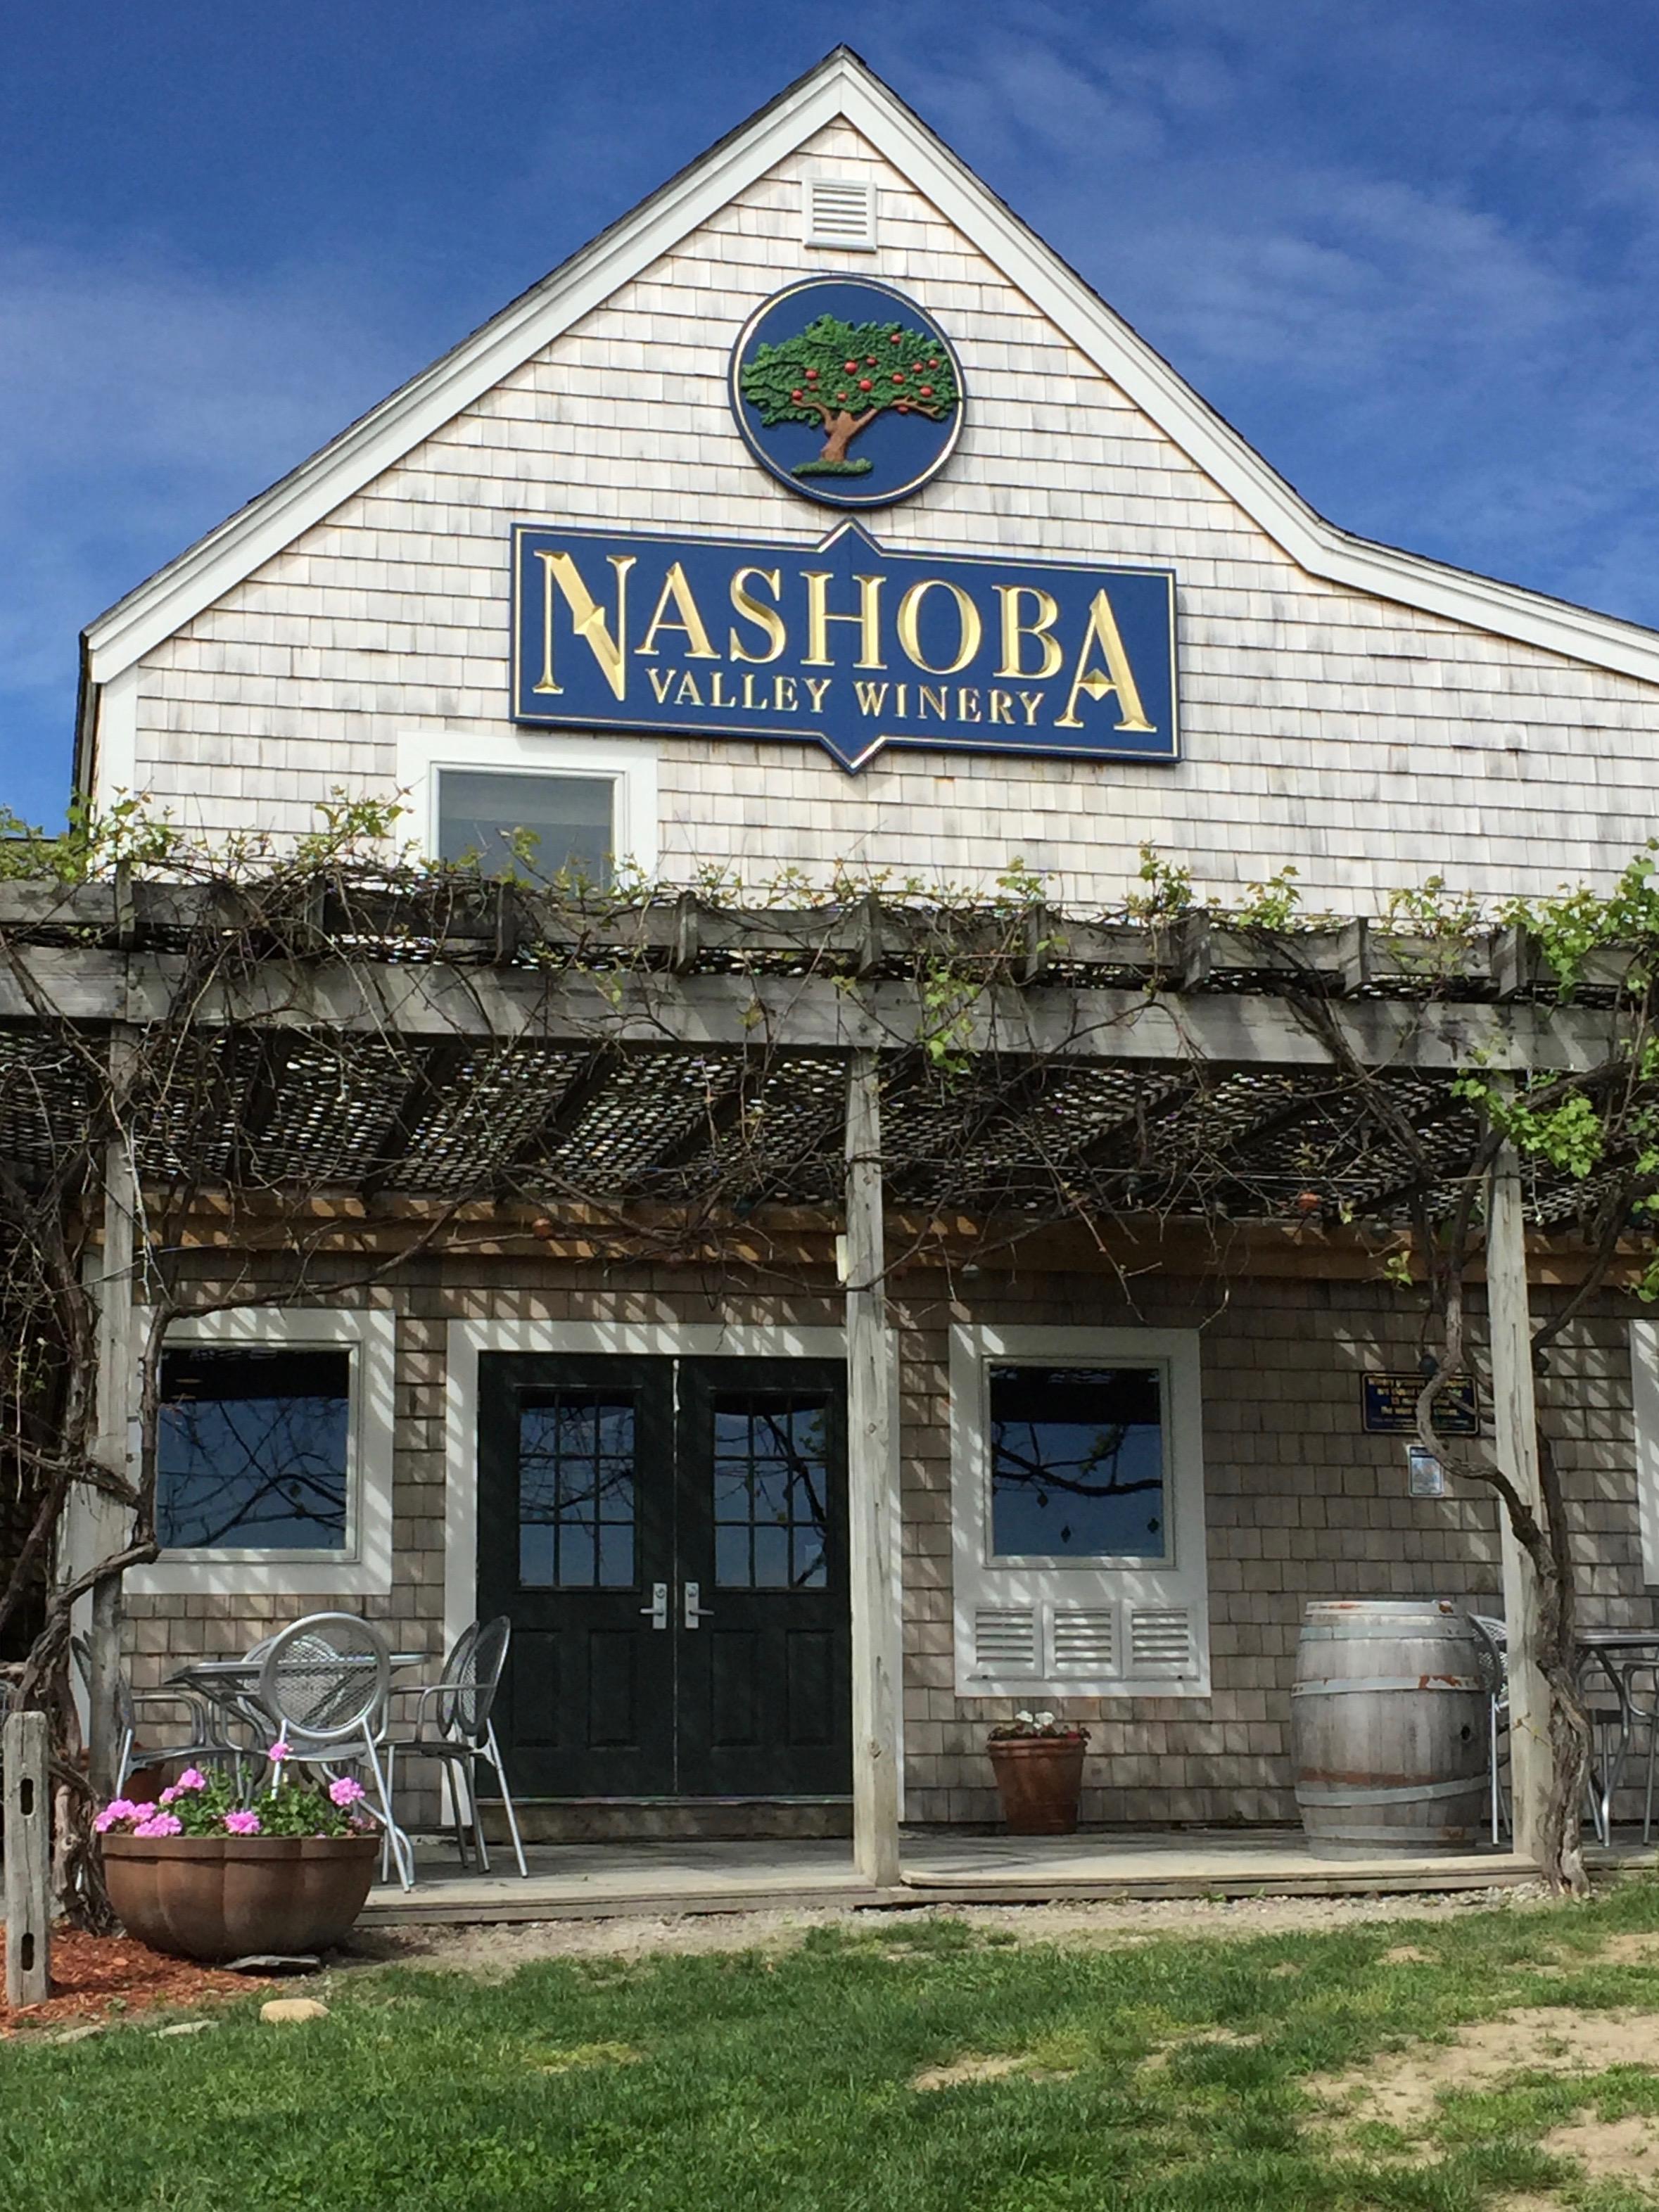 Nashoba Valley Winery.jpg